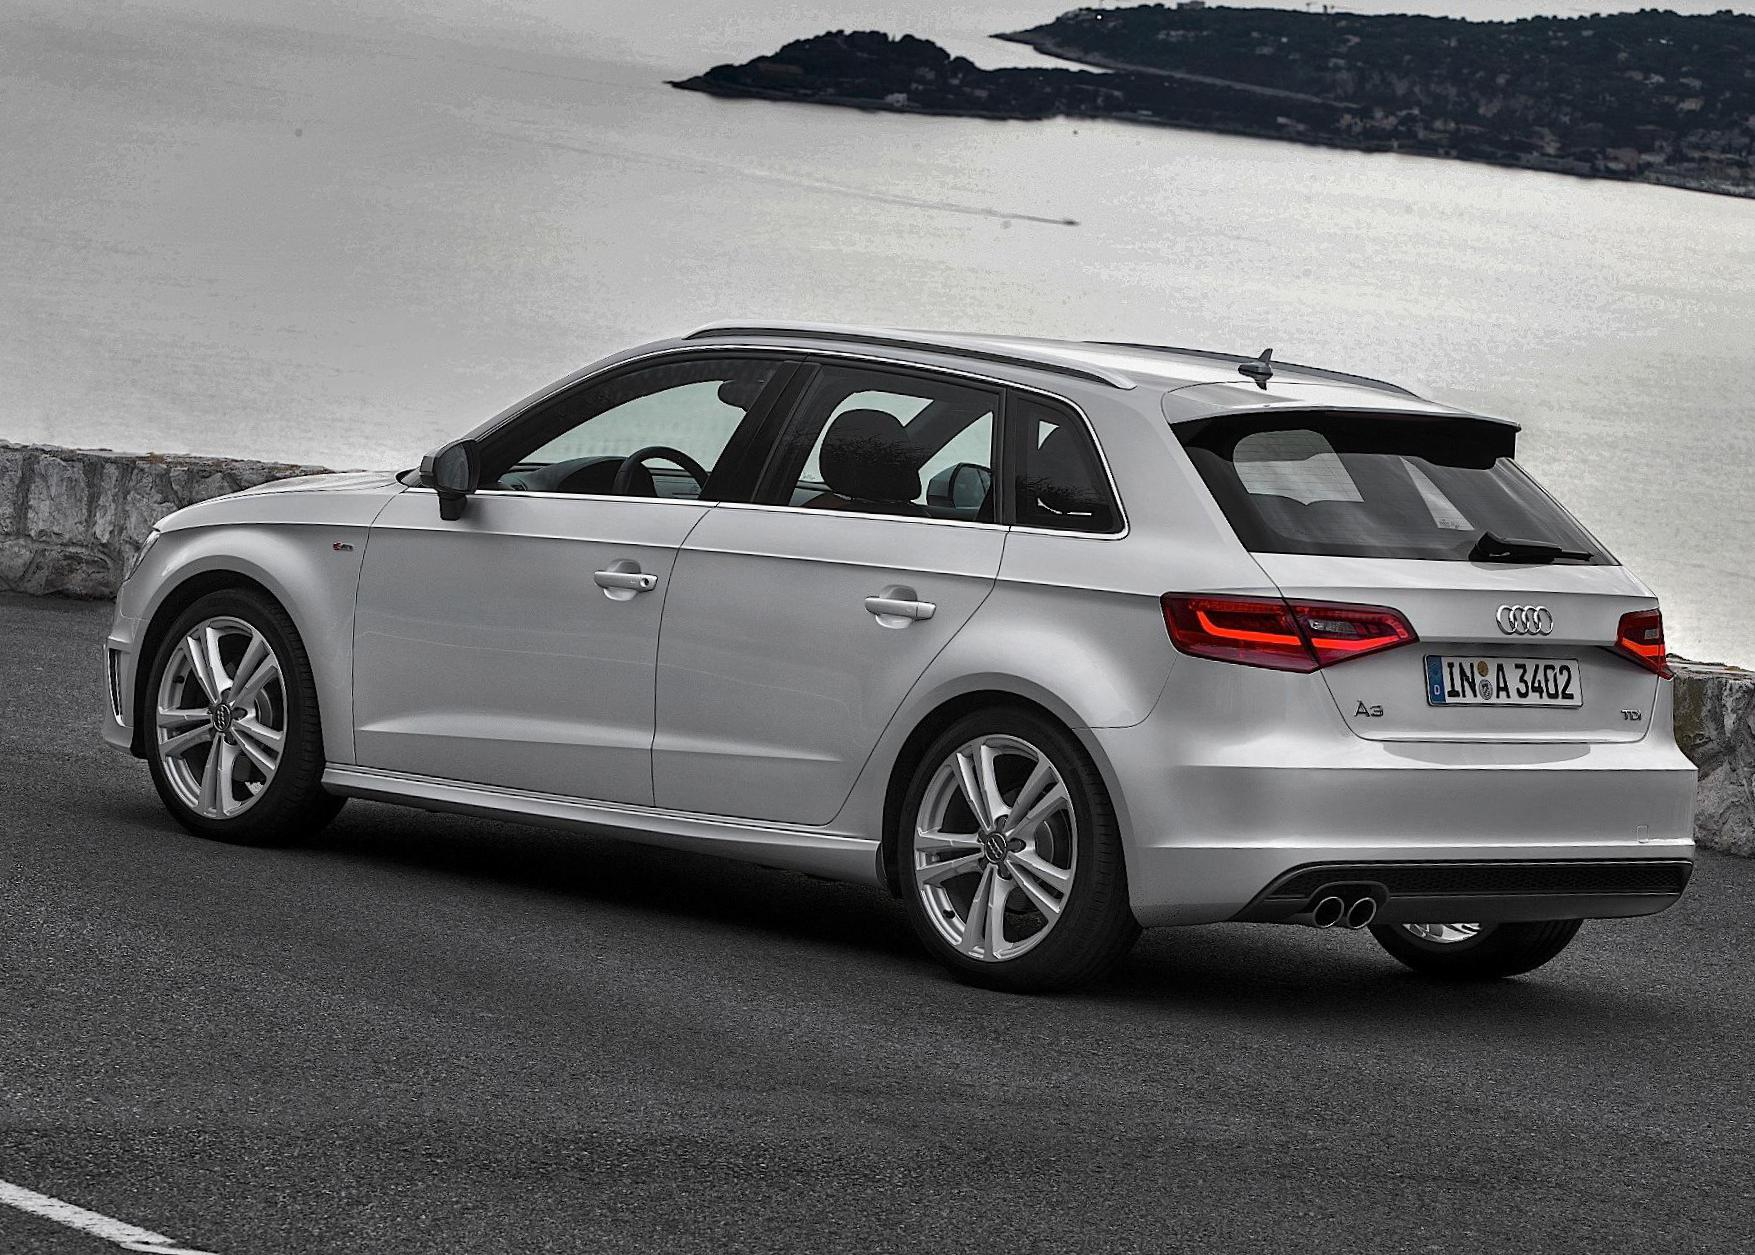 Kelebihan Audi A3 Sportback 2011 Murah Berkualitas